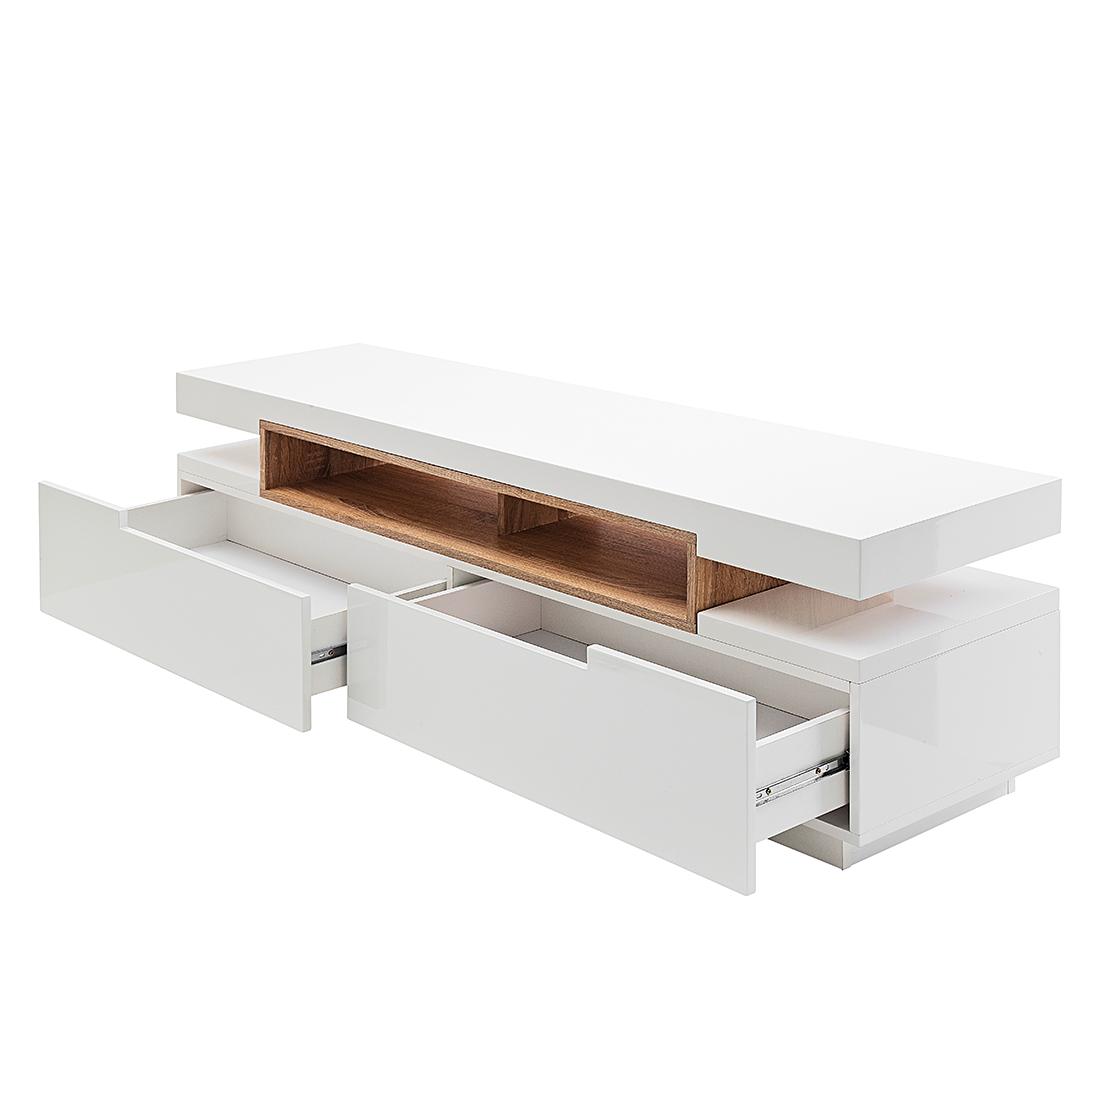 lowboard h ngend braun interessante ideen f r die gestaltung eines raumes in. Black Bedroom Furniture Sets. Home Design Ideas